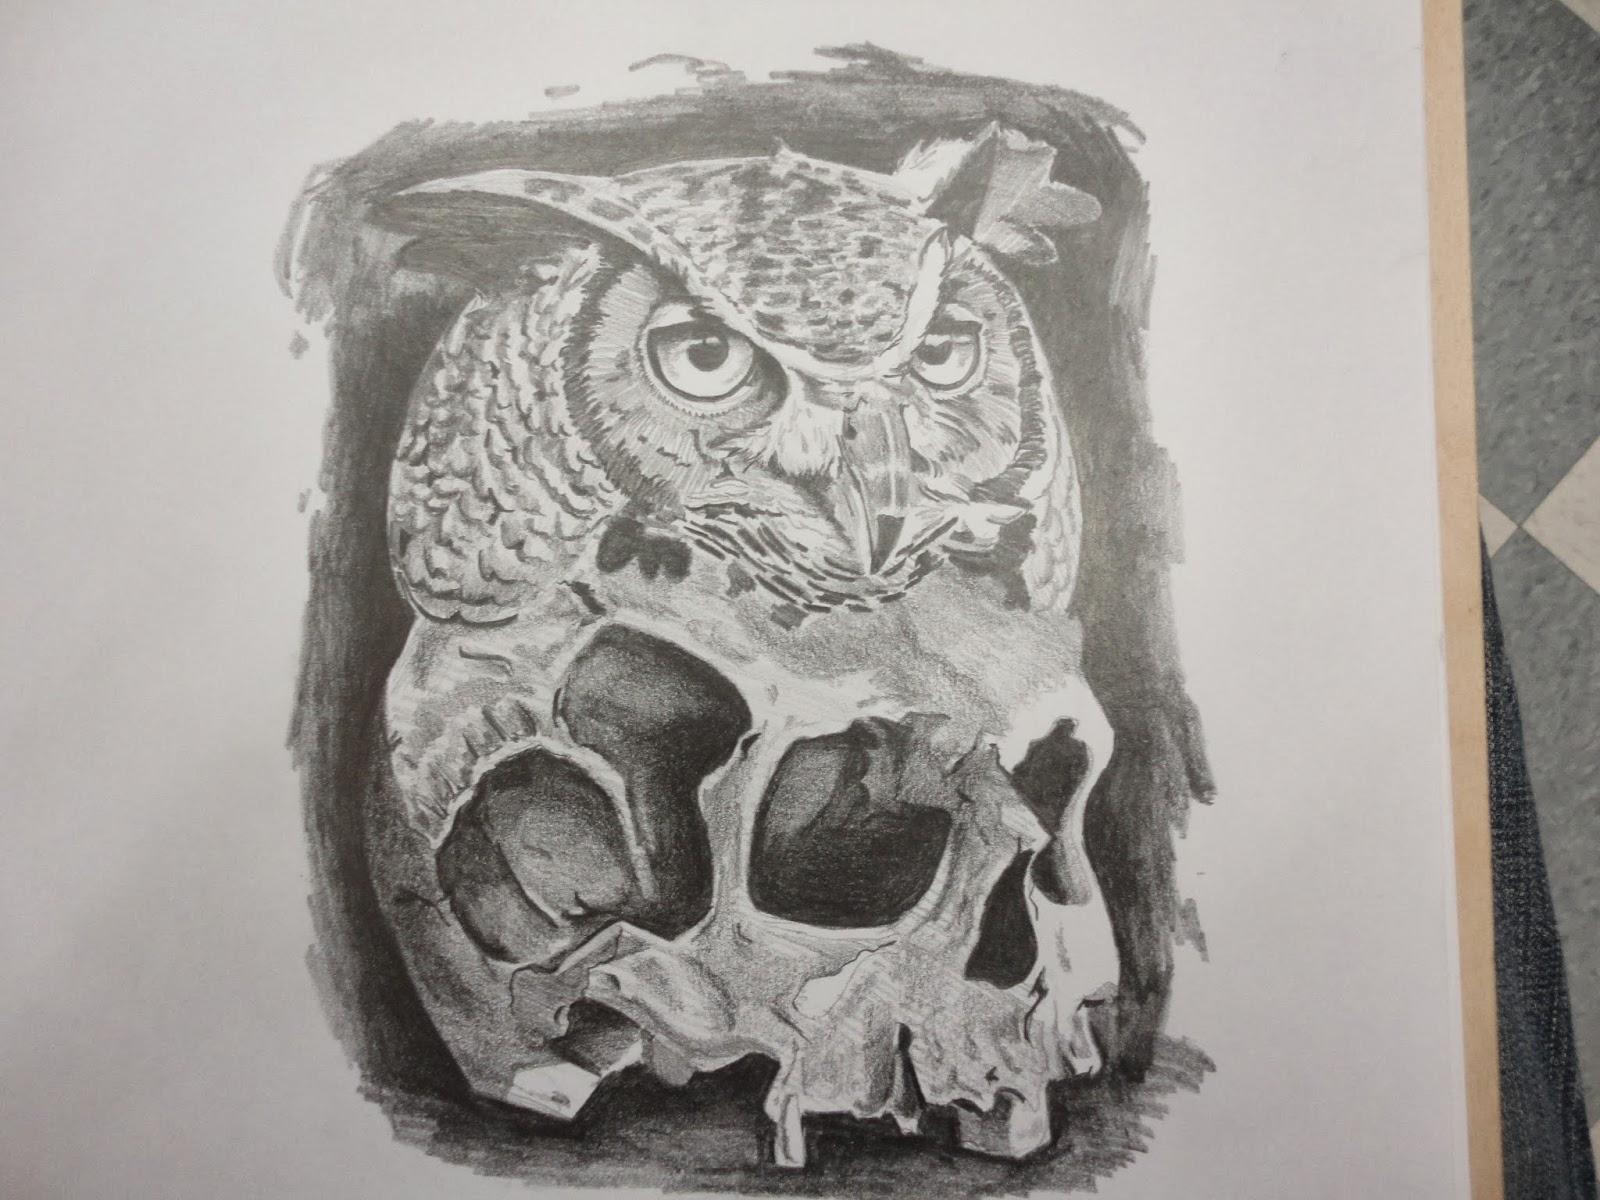 Pin Owl And Skull On Books Tattoo on Pinterest - photo#29